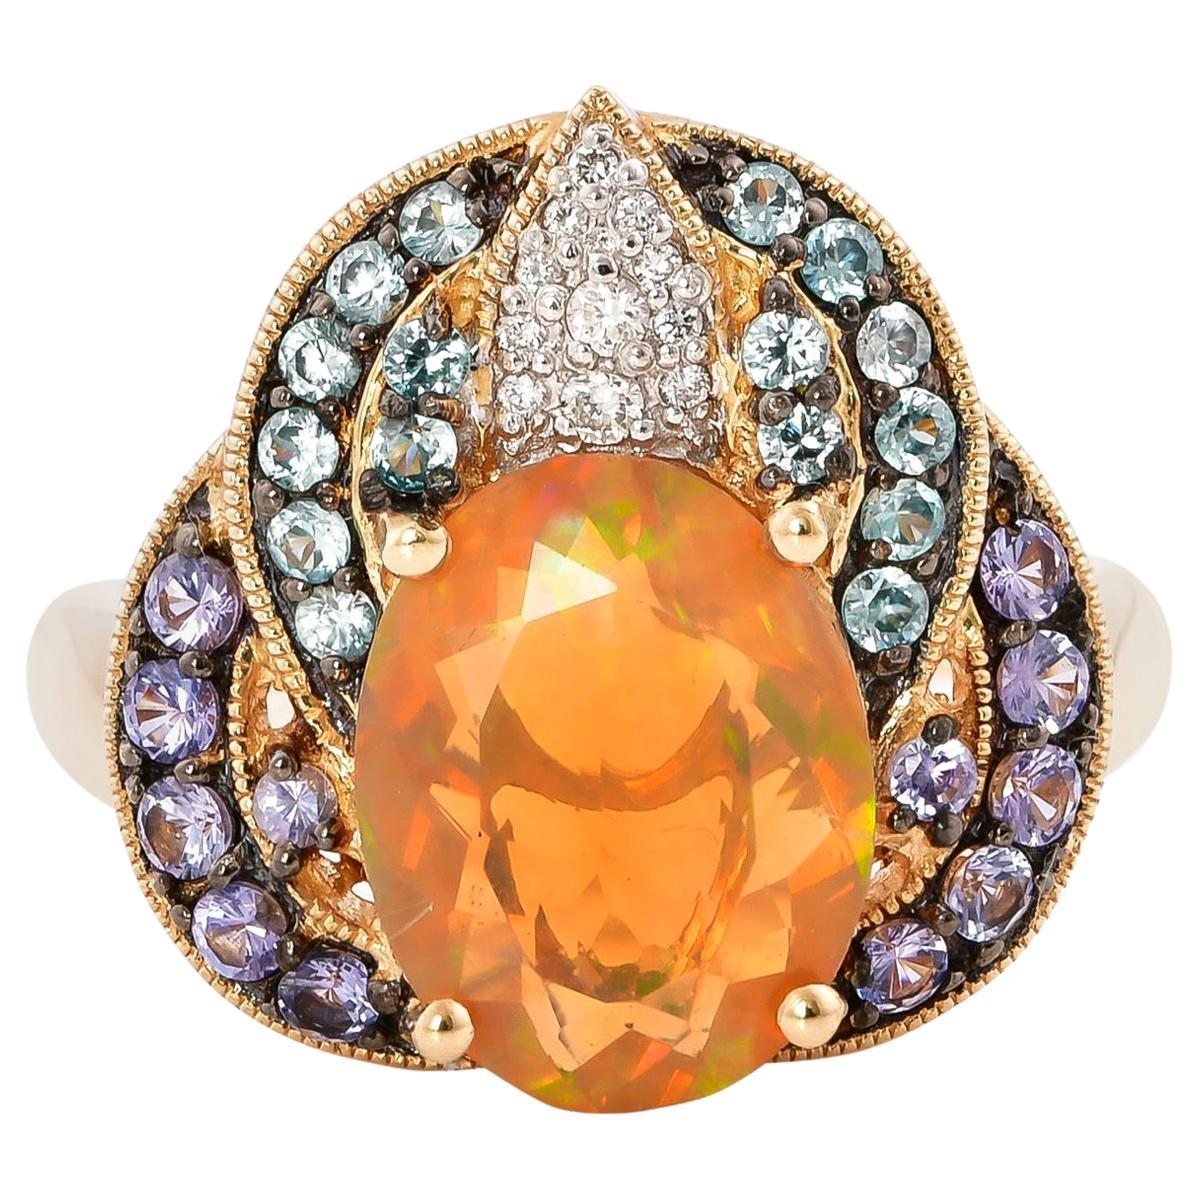 2.02 Carat Ethiopian Opal Ring in 14 Karat Yellow Gold with Diamonds